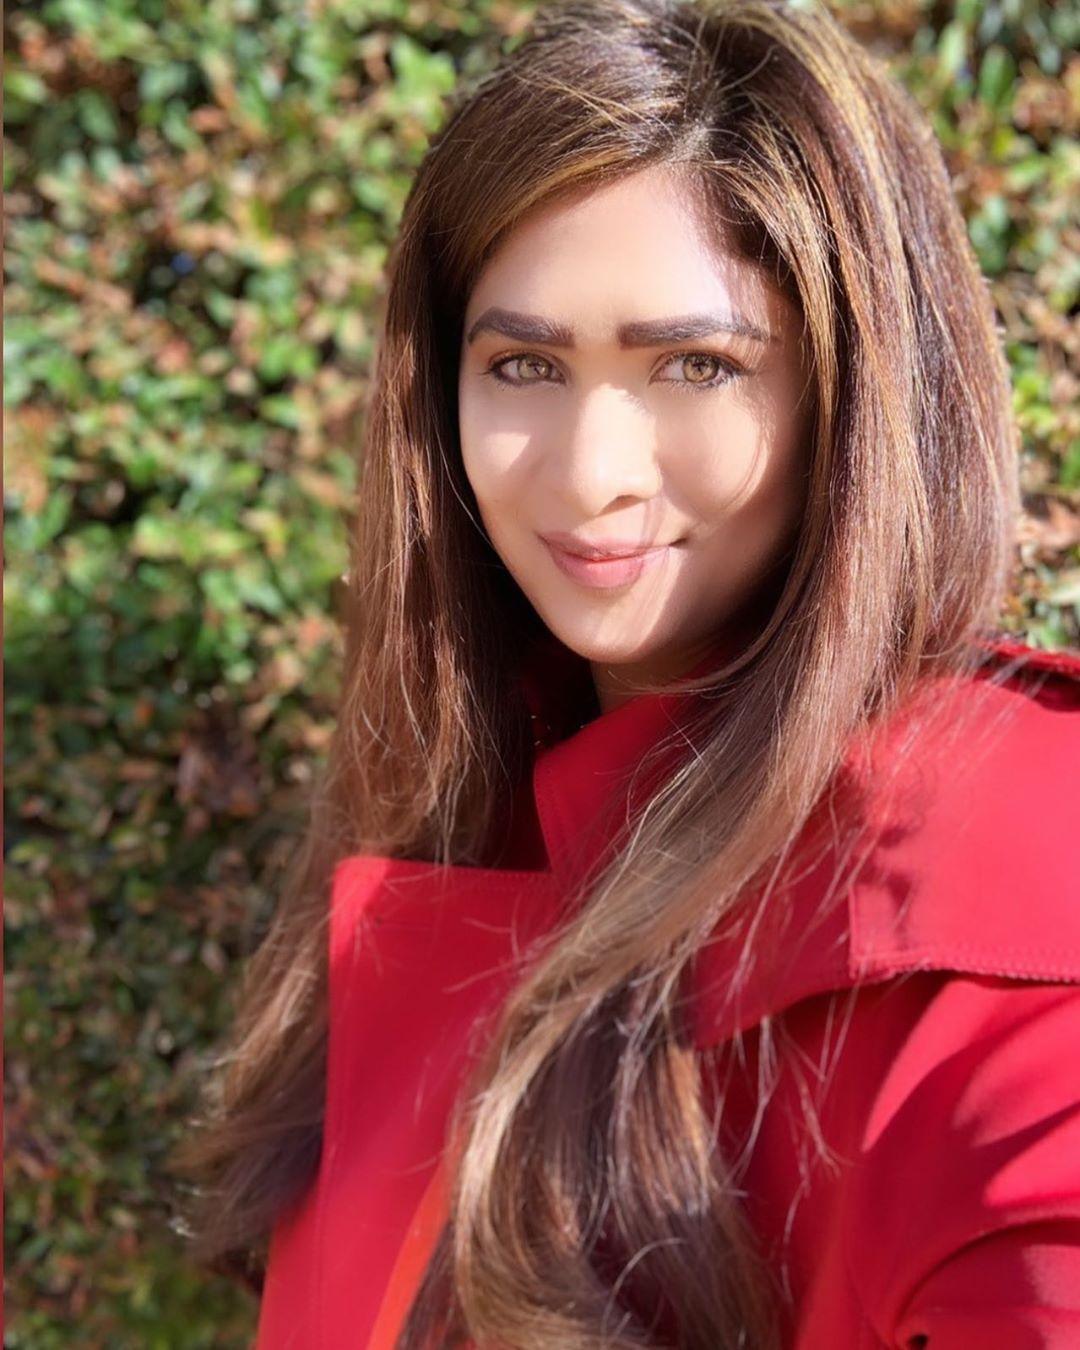 Actress, Models, Girls and Other Beauty: Anarkali Akarsha